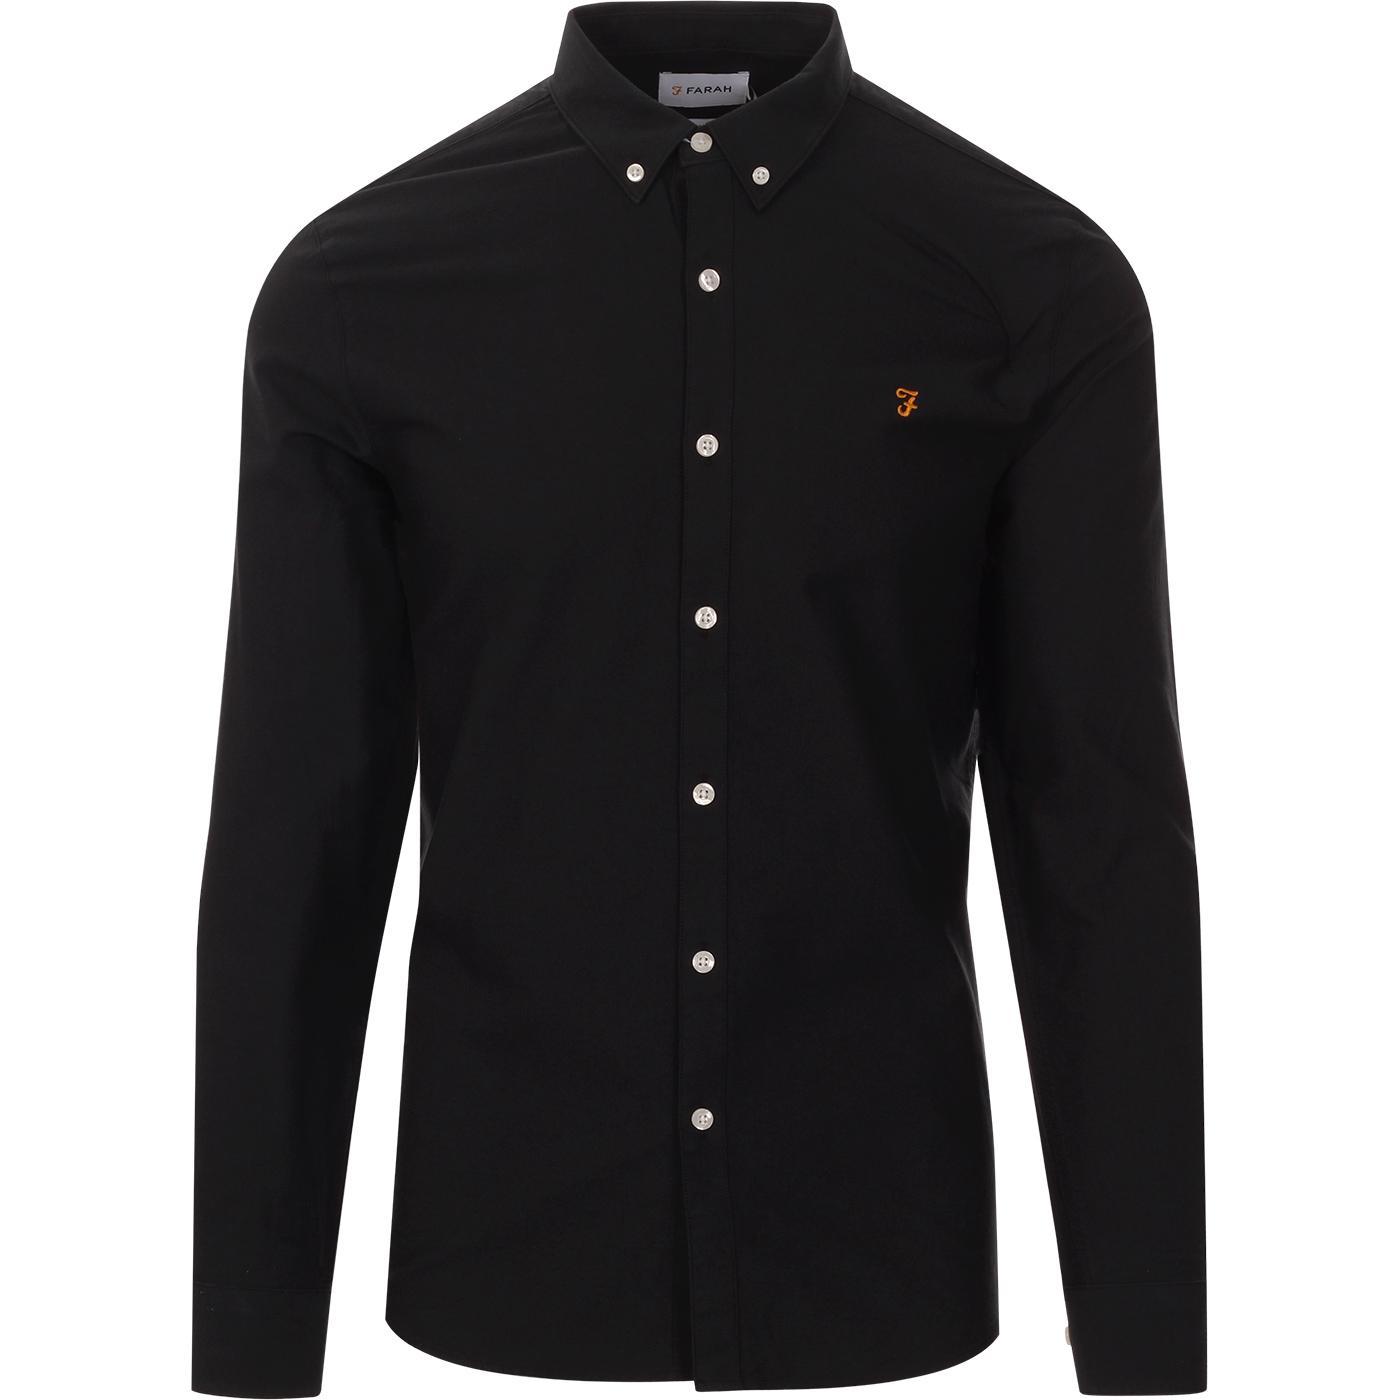 Brewer FARAH Slim Fit Mod L/S Oxford Shirt In Ink